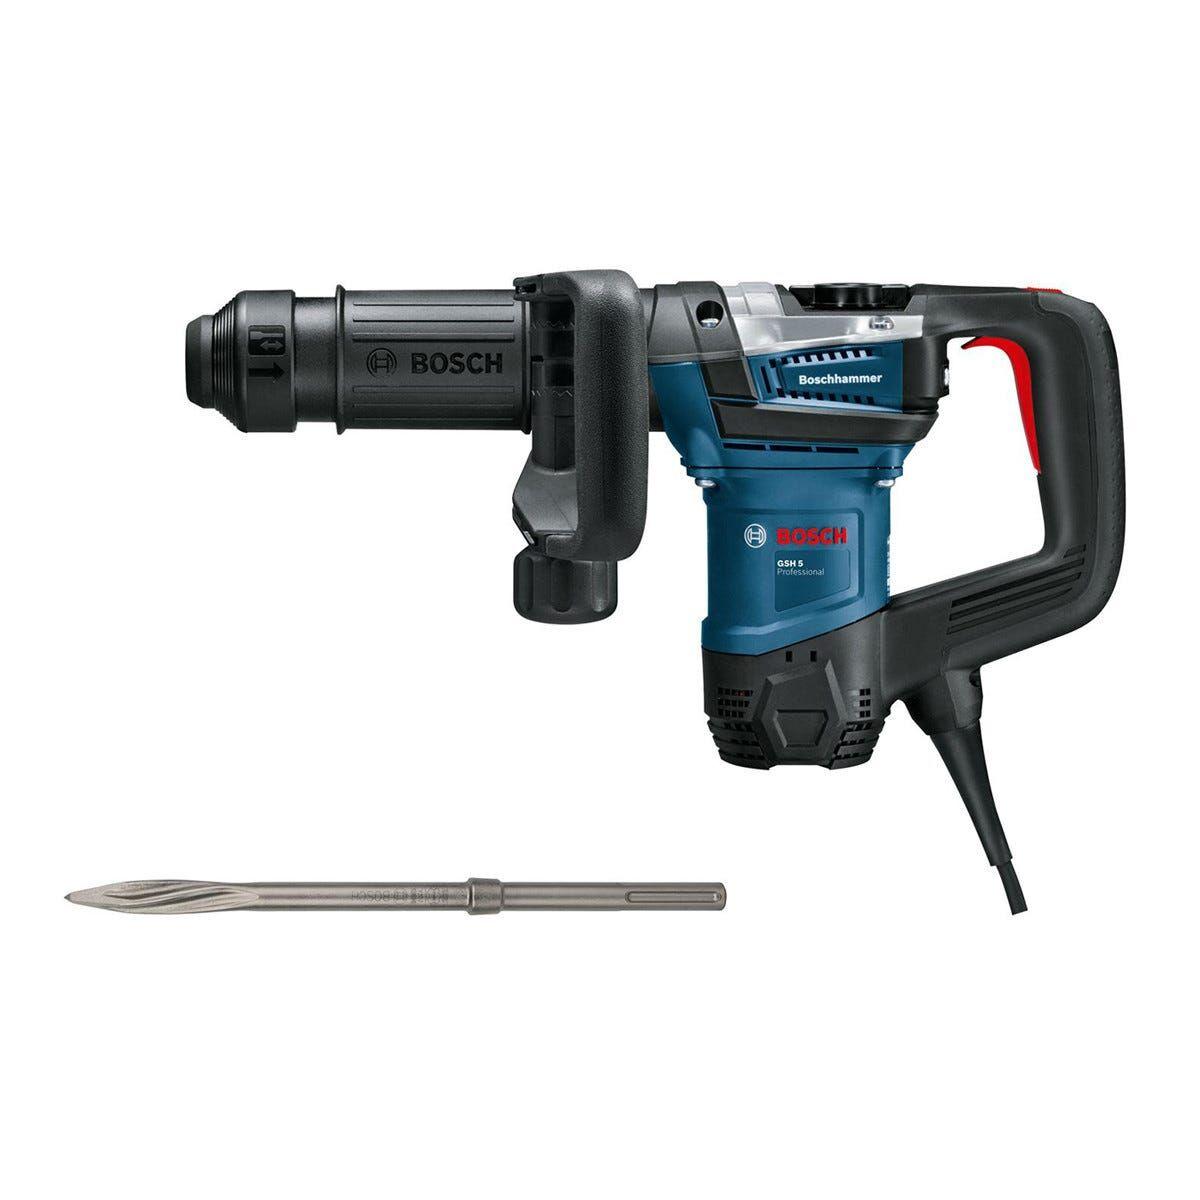 Bosch Demolitore 1100 W Gsh 5 7,5 J Professional 2850 Colpi/min Peso 5,6 Kg